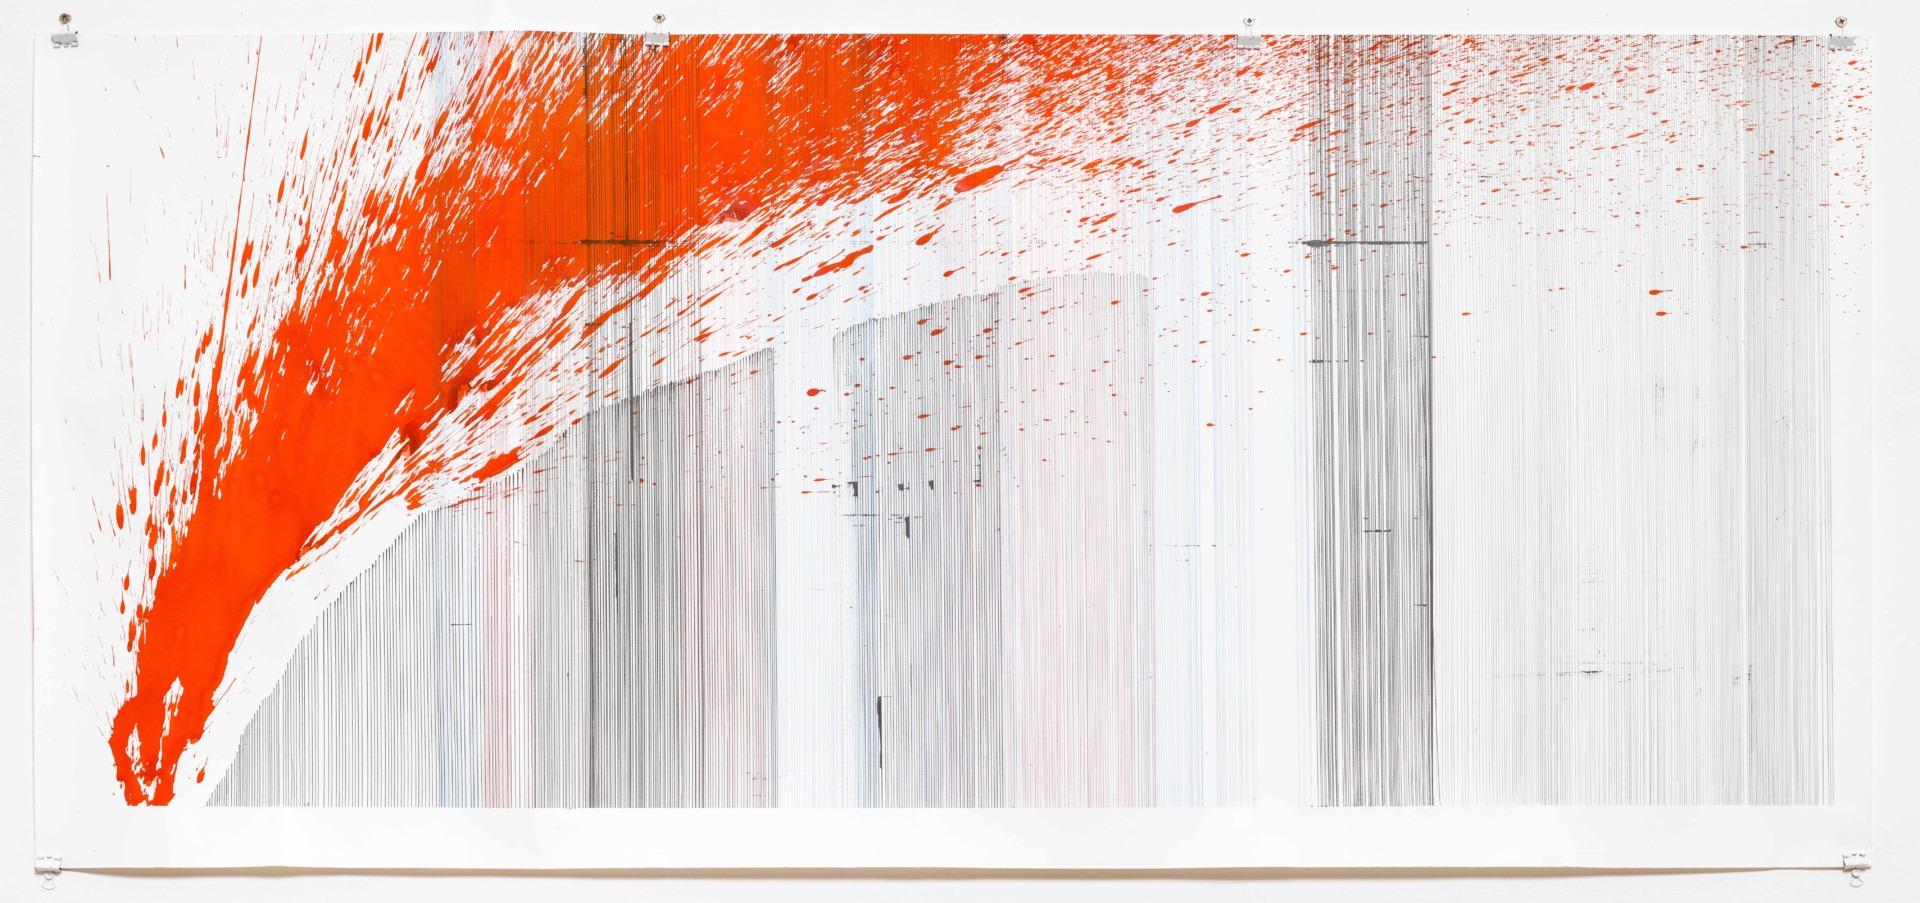 Op.101. ink on paper, 68x150 cm, 2016